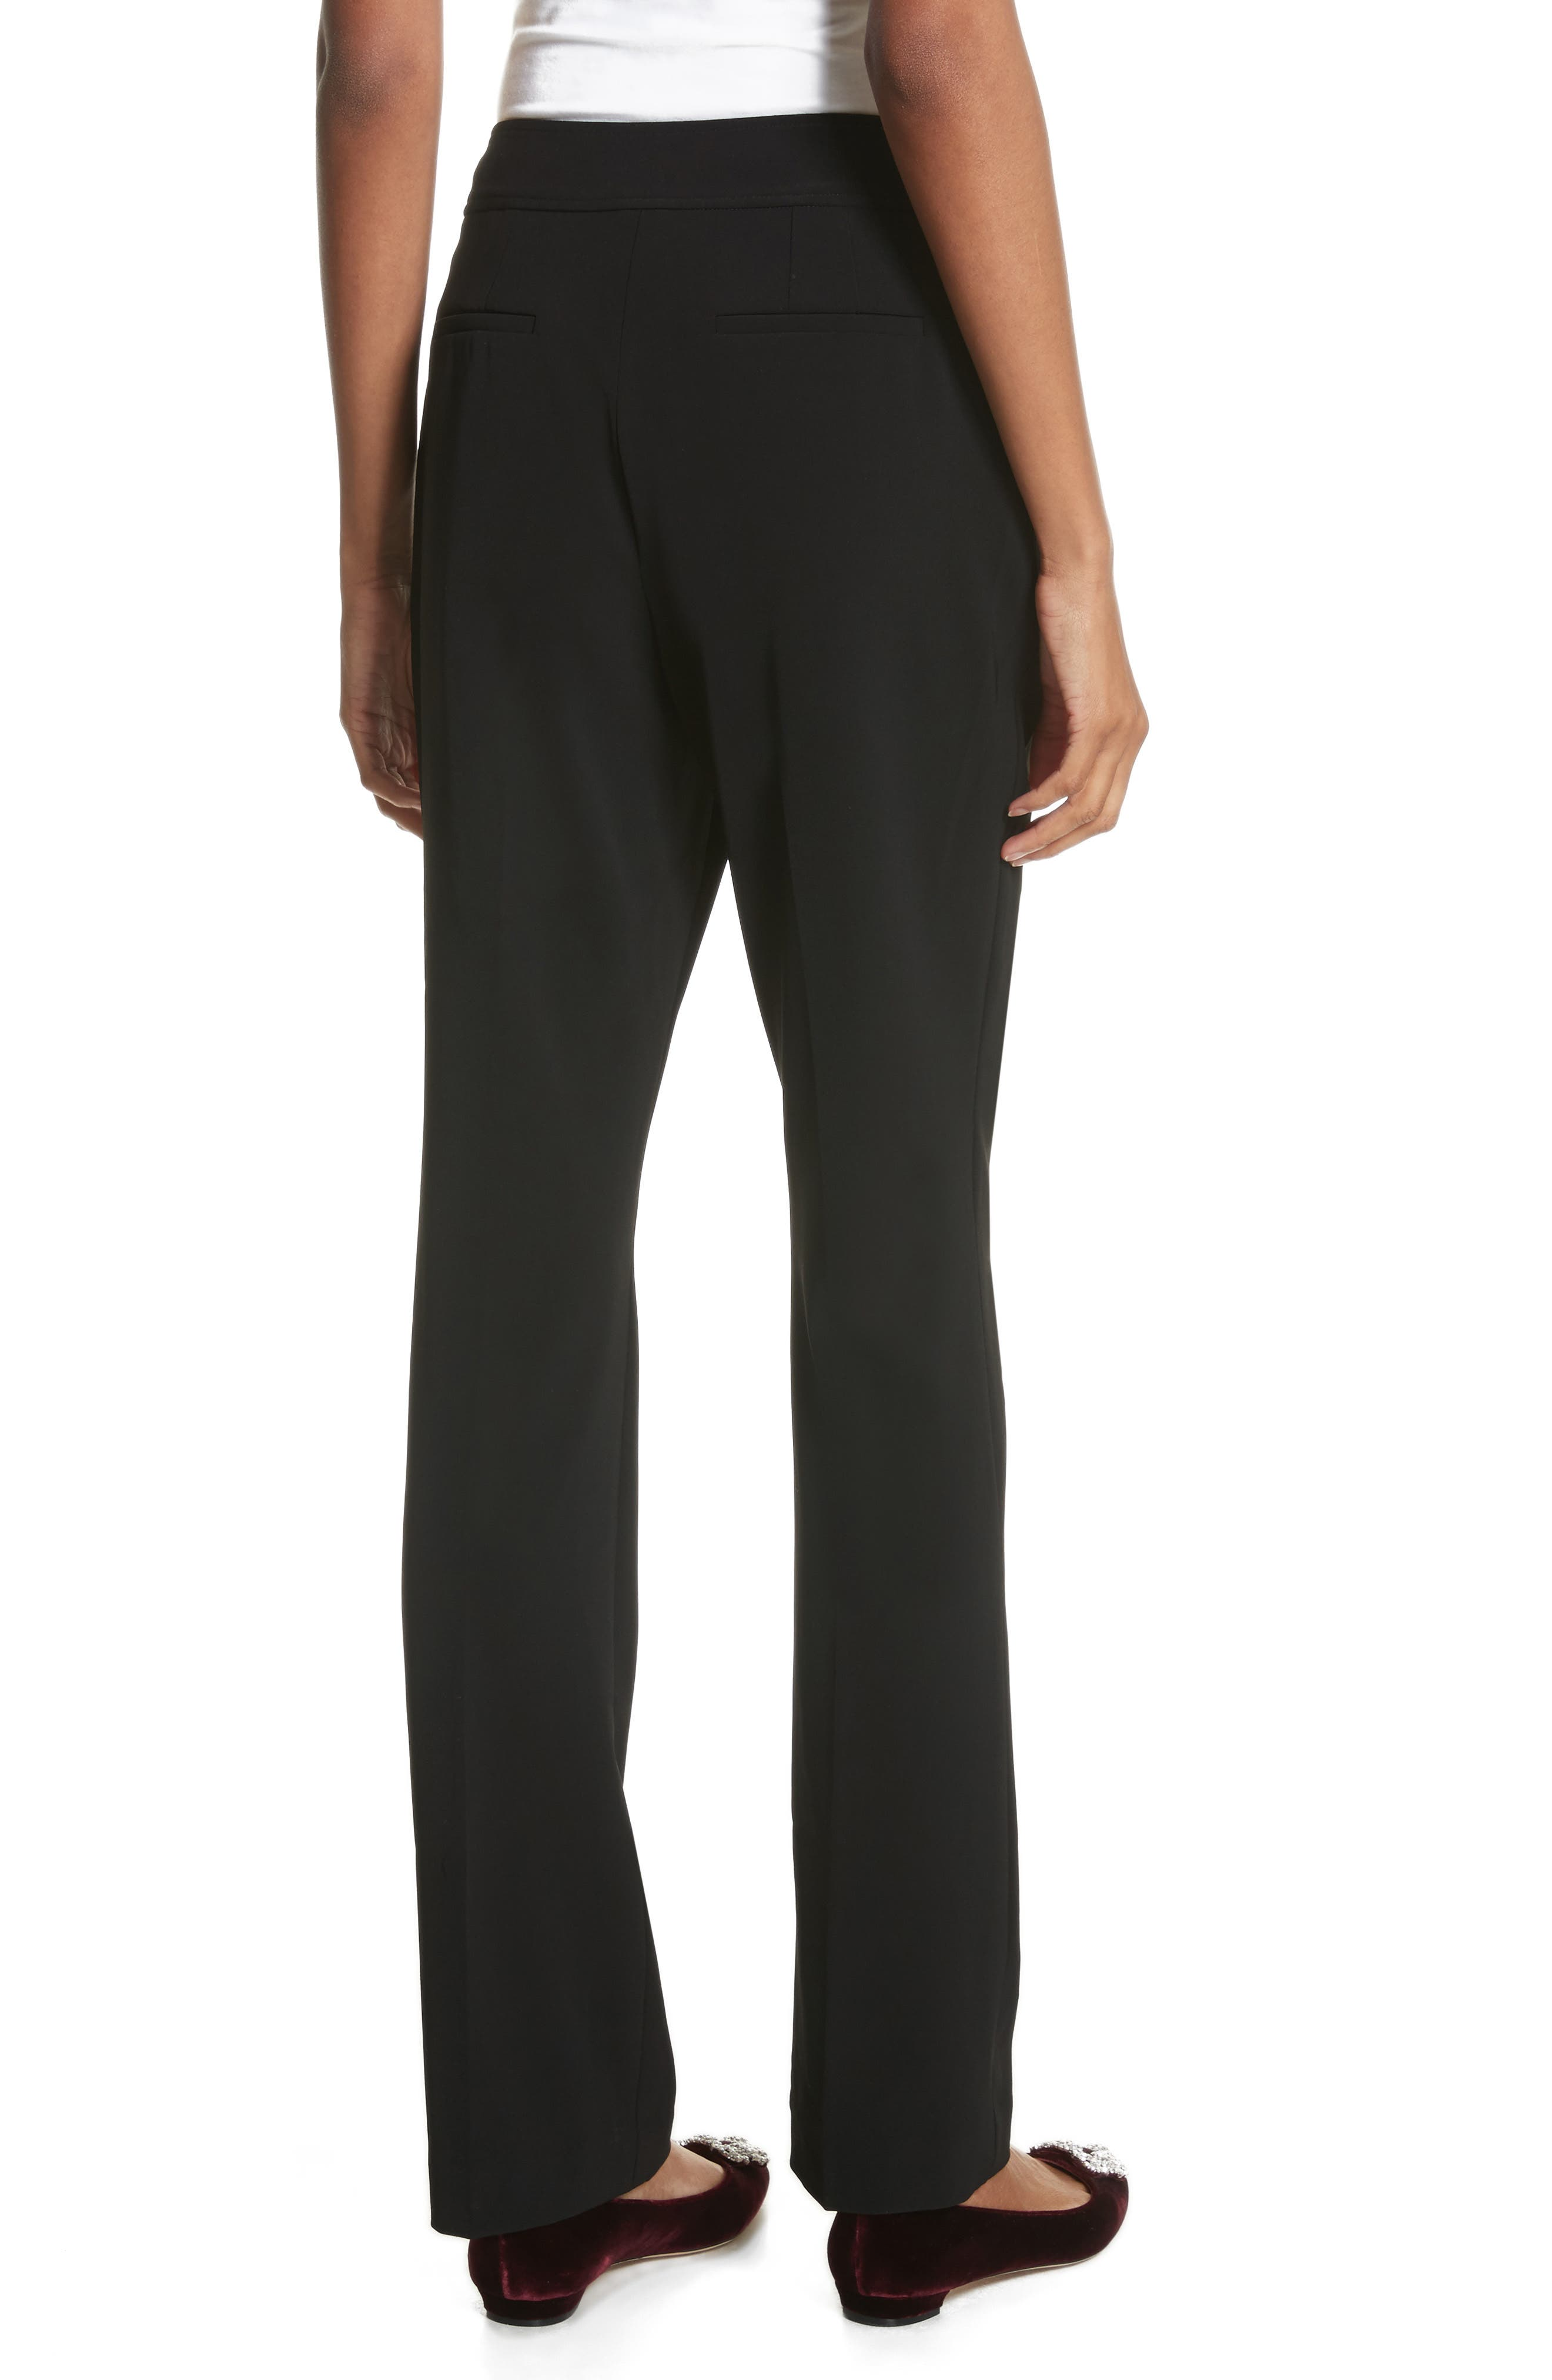 Yulit High Waist Trousers,                             Alternate thumbnail 2, color,                             001